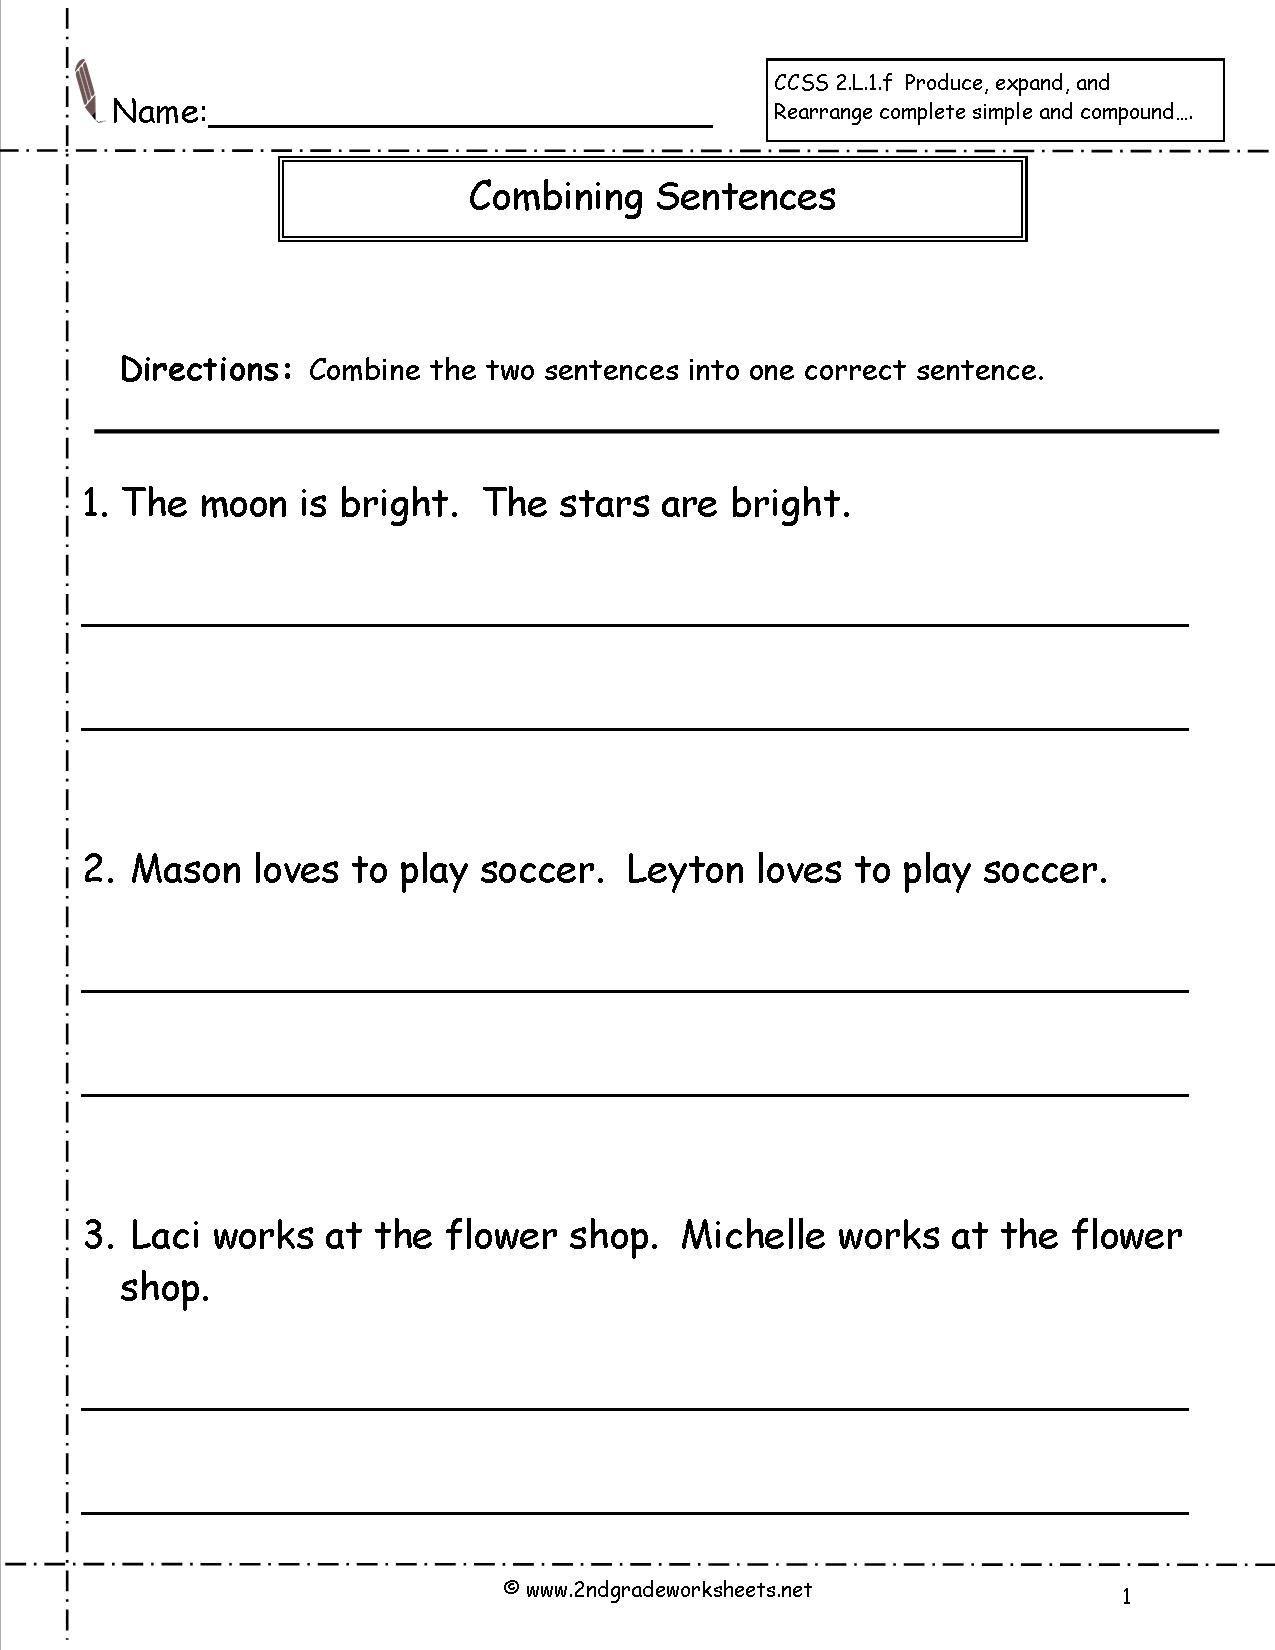 Combining Sentences Worksheet 5th Grade Bining Sentences Worksheet